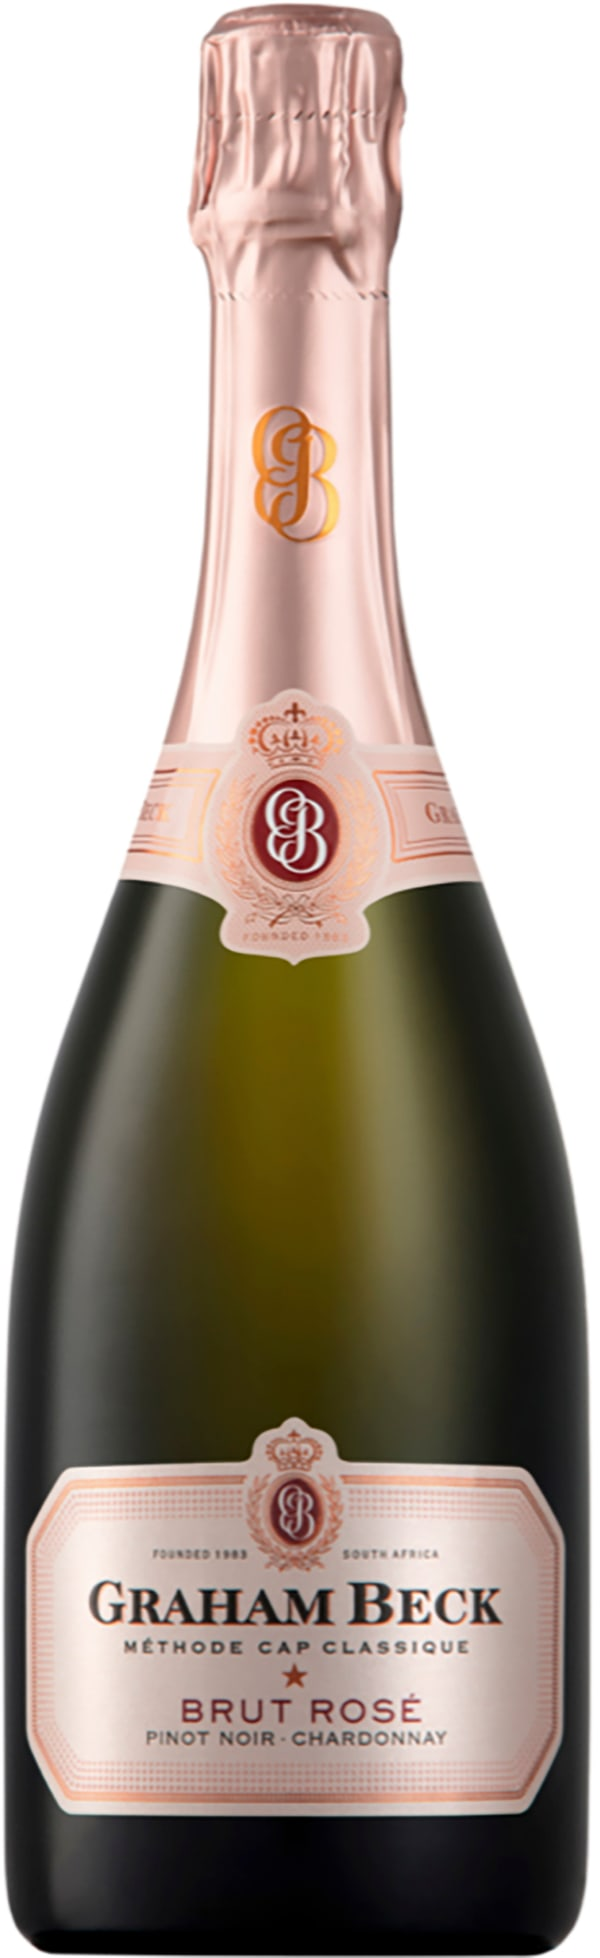 Graham Beck Méthode Cap Classique Rosé Brut